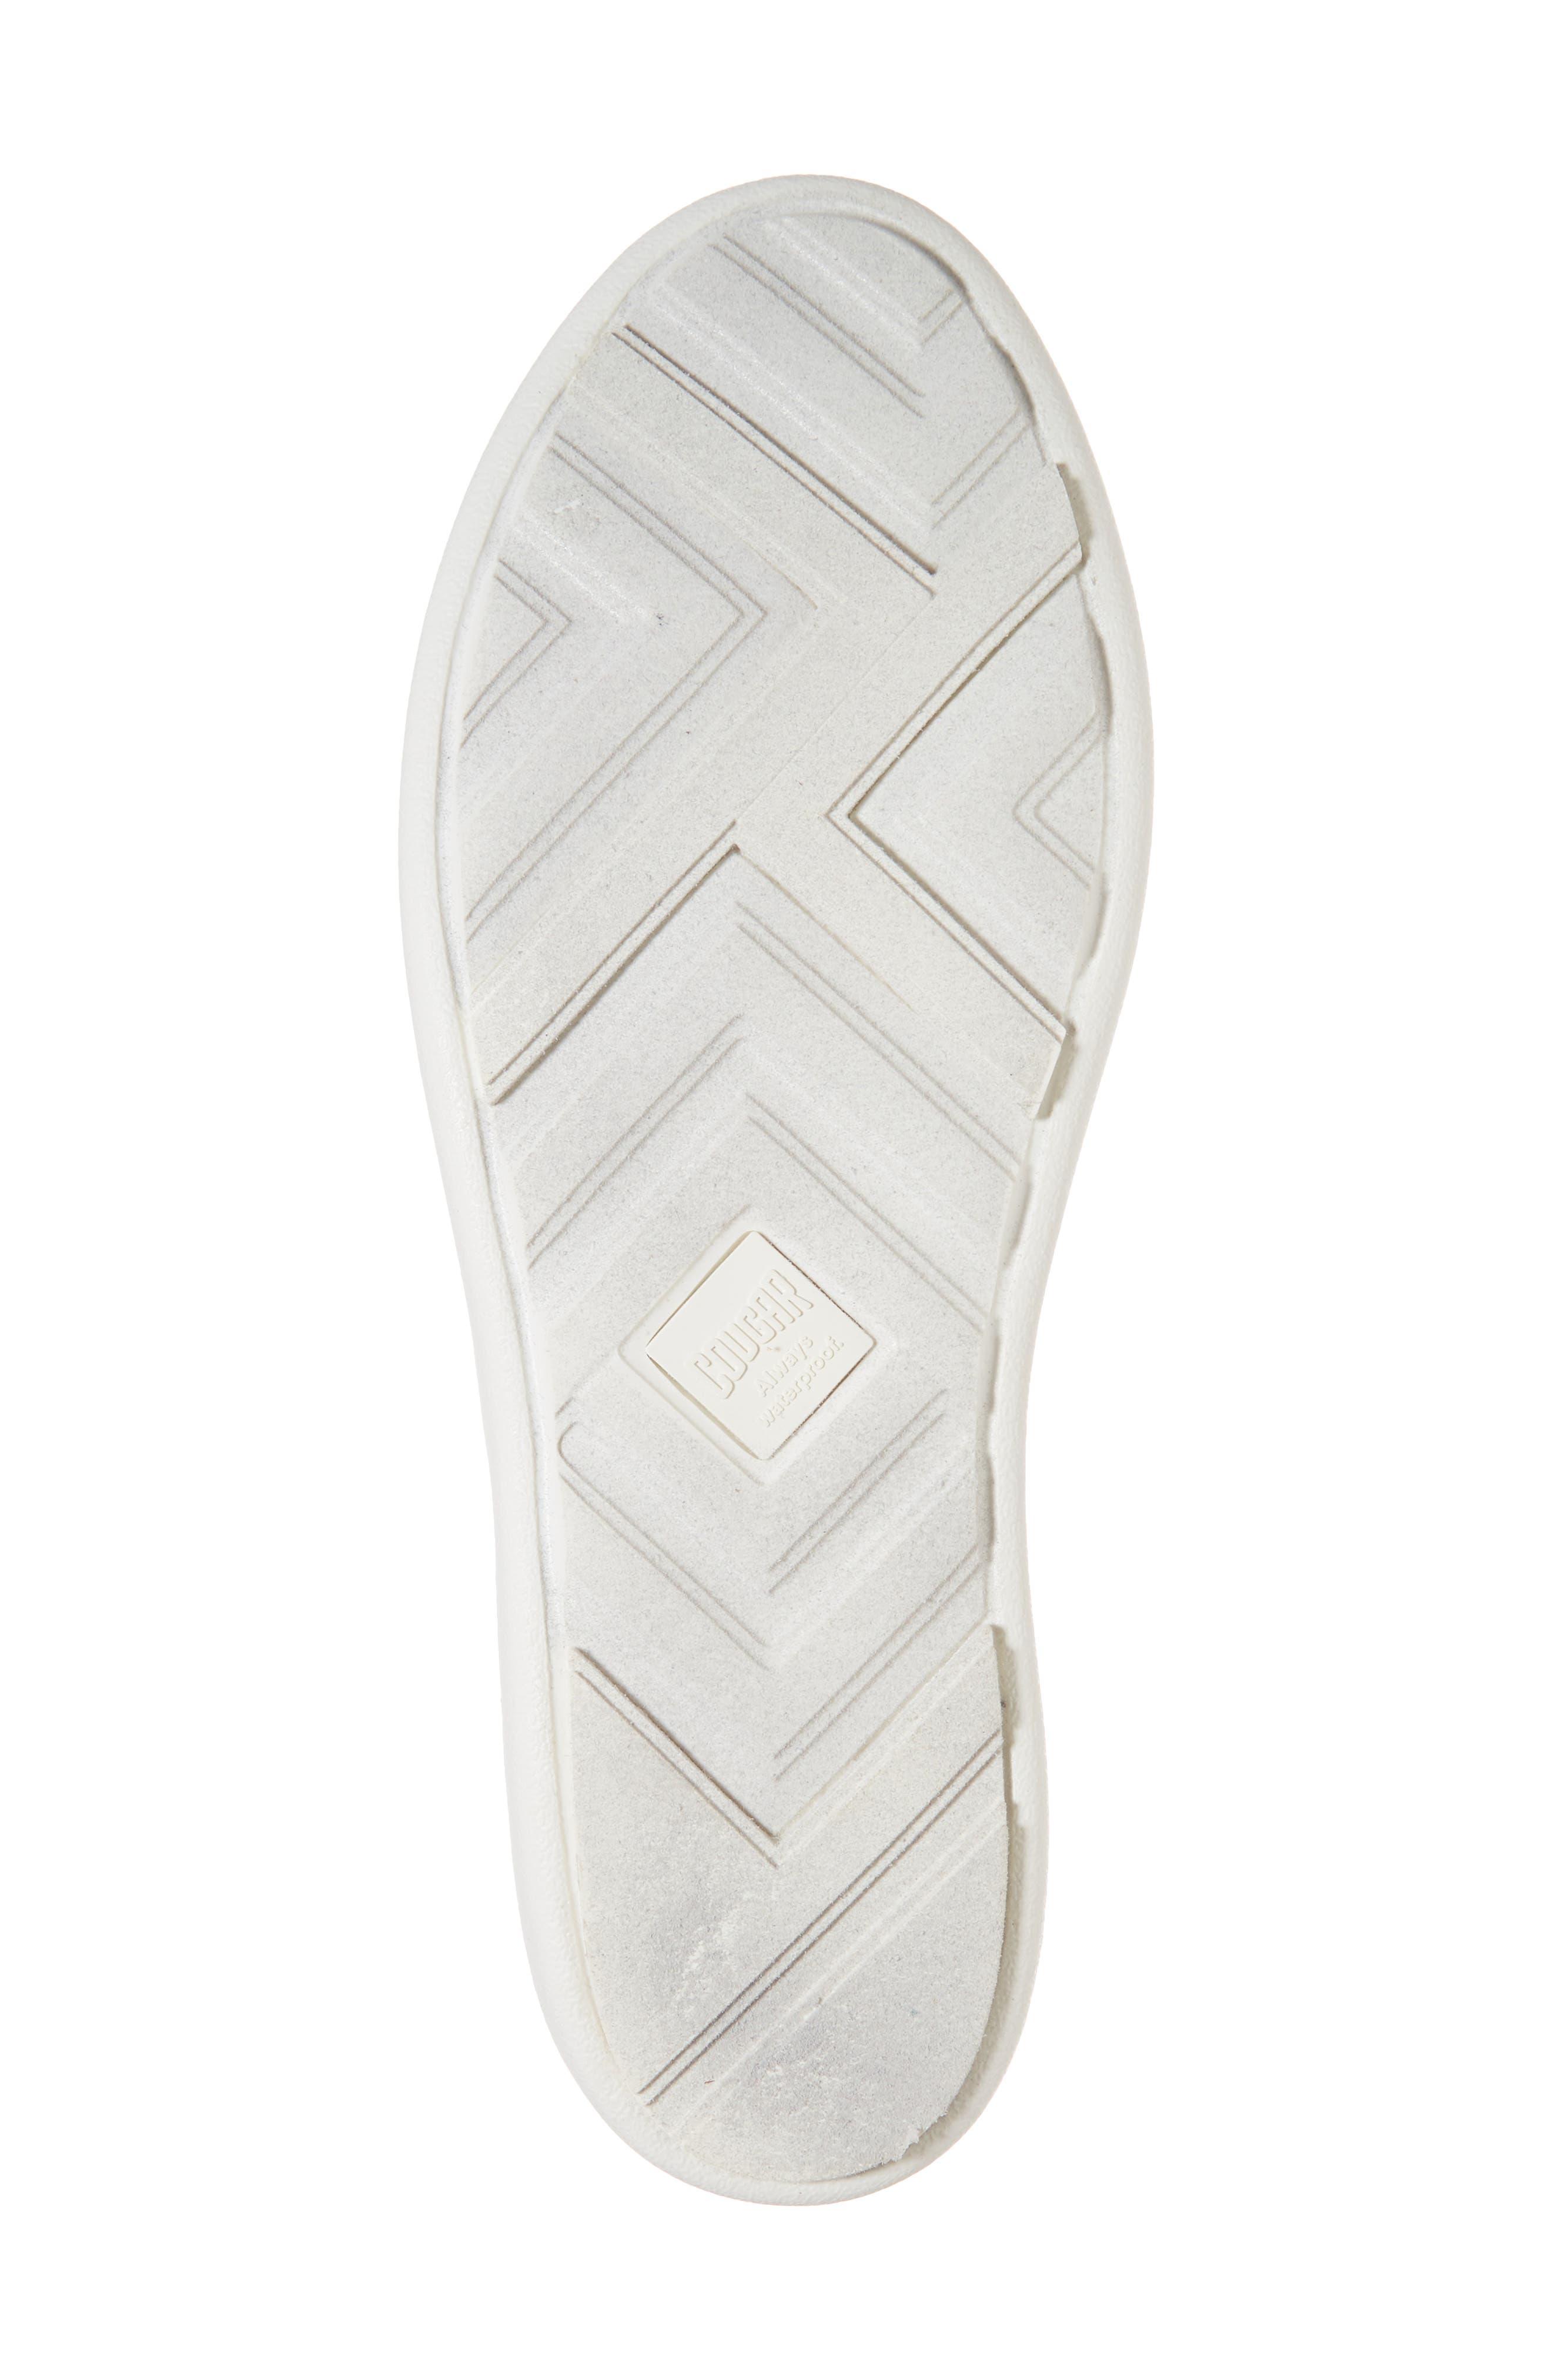 Rainy Day Waterproof Slip-On Sneaker,                             Alternate thumbnail 6, color,                             001